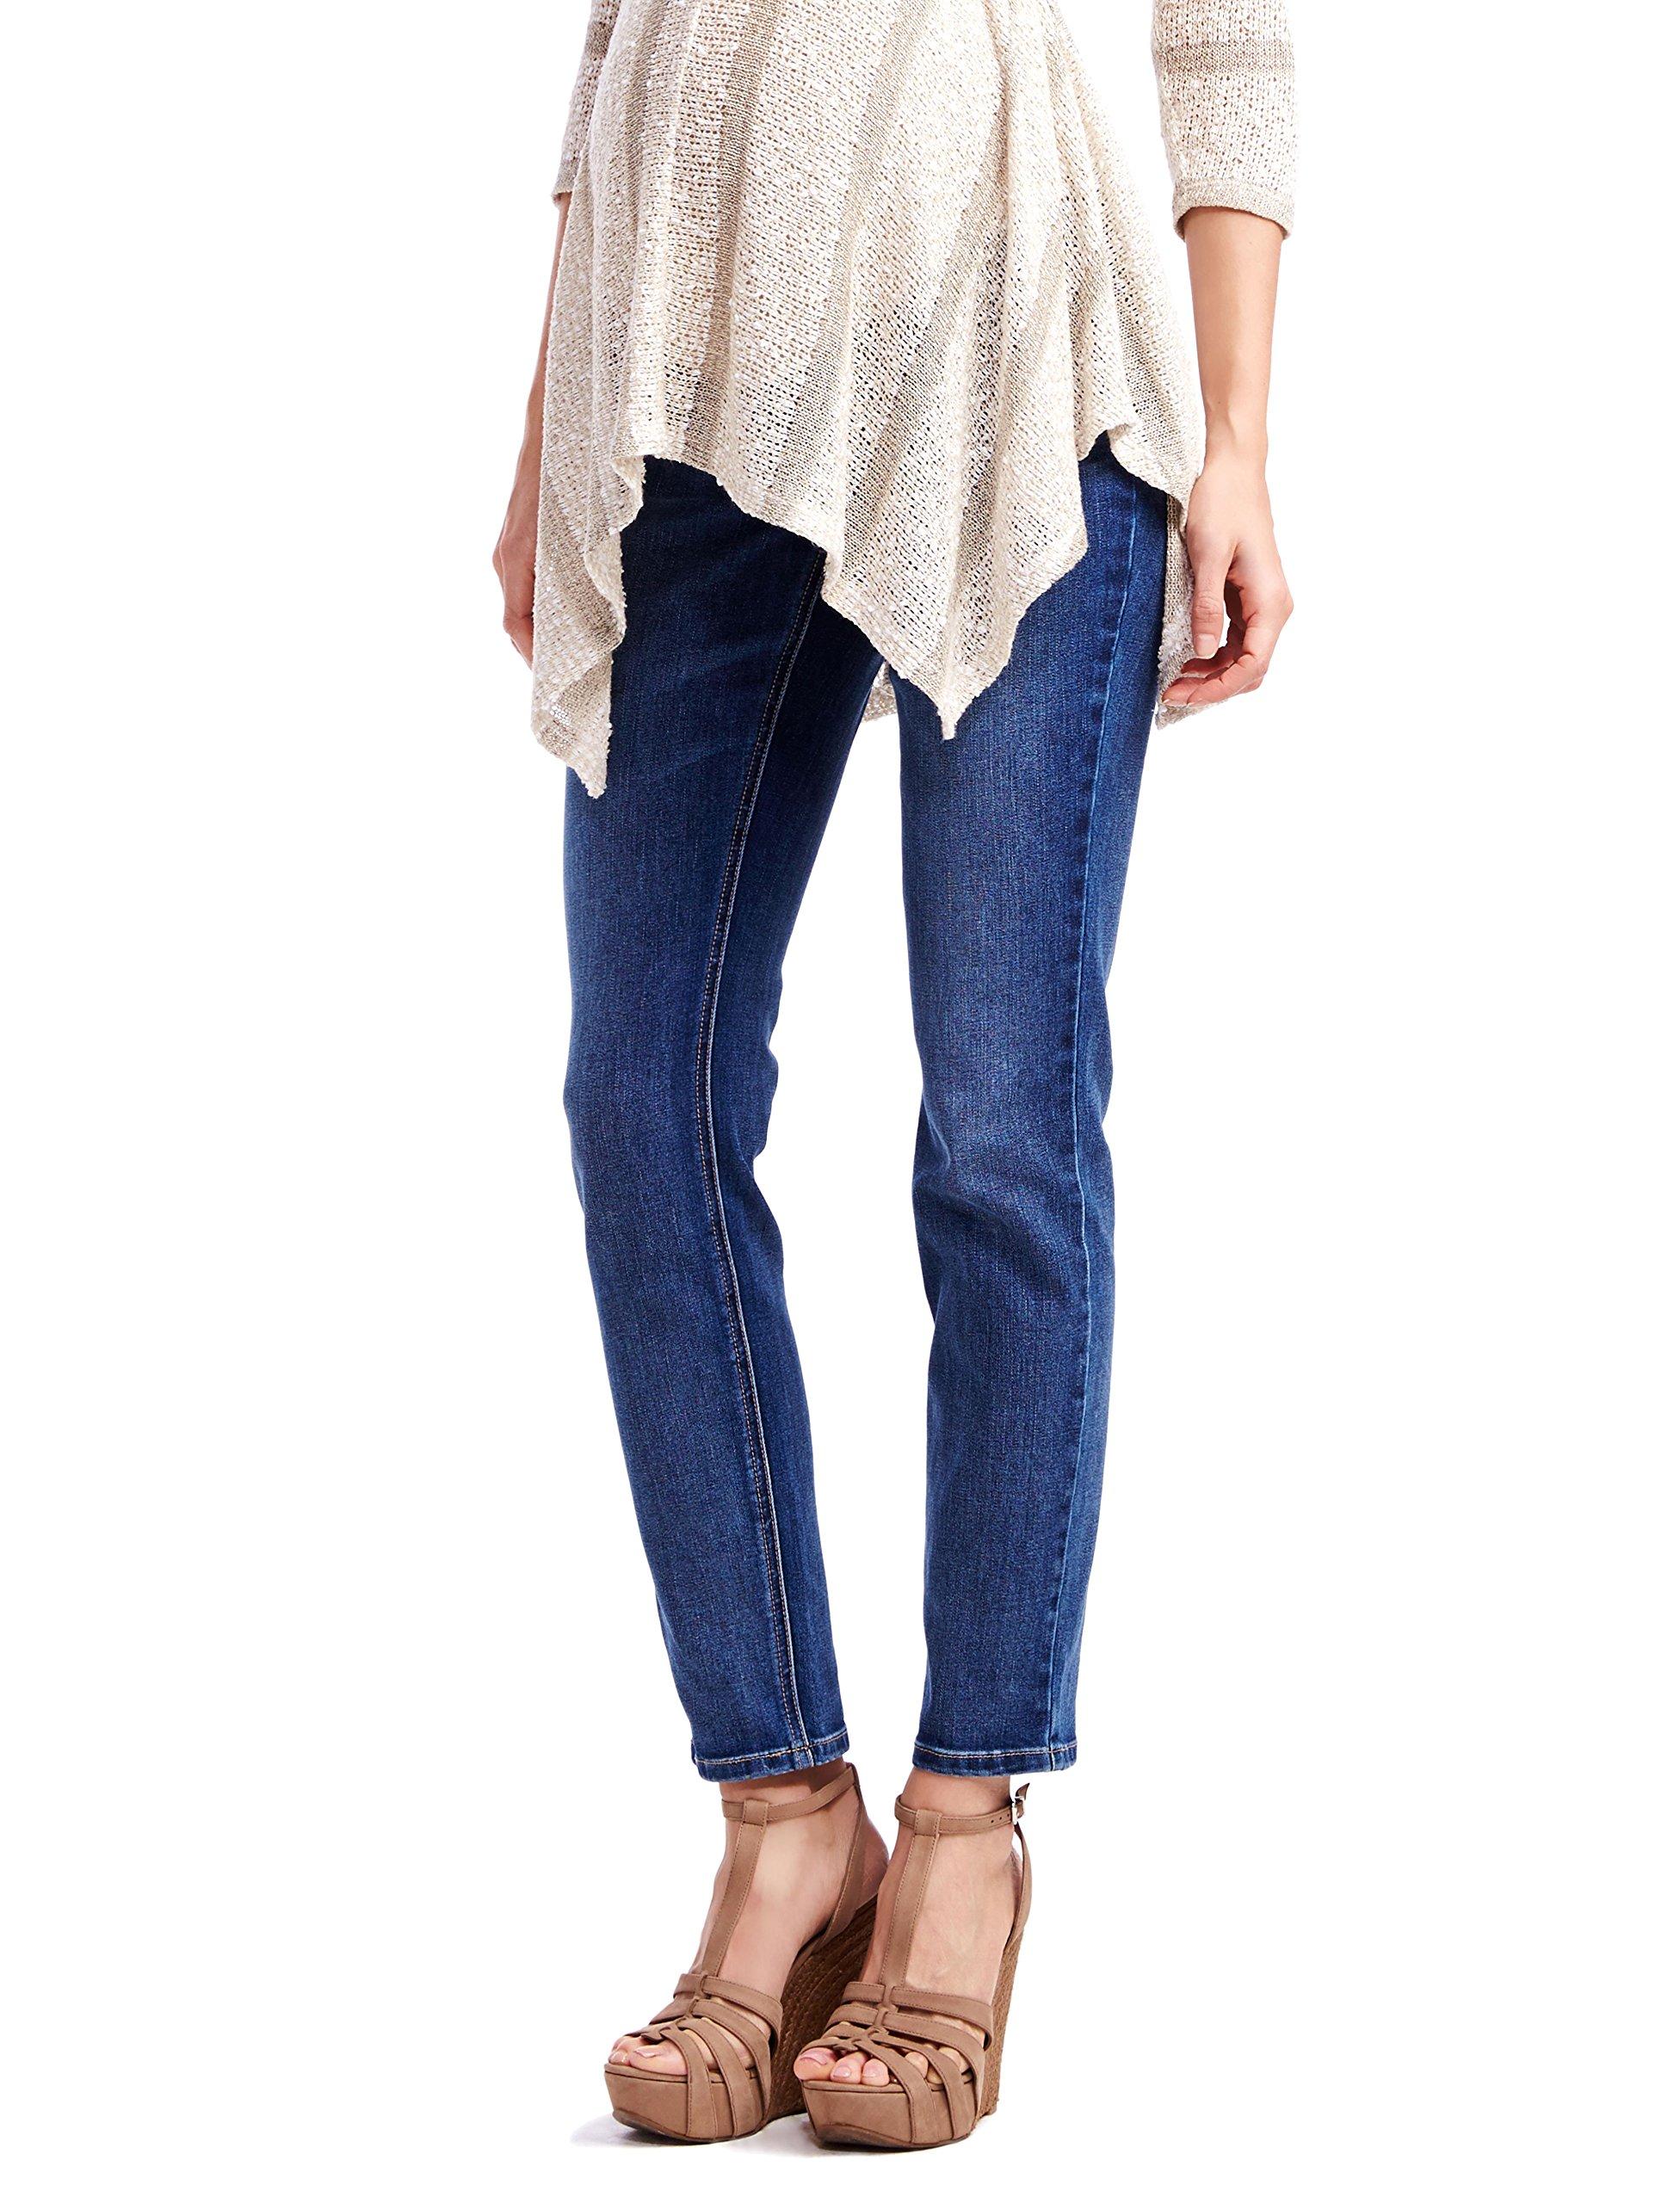 Jessica Simpson Petite Secret Fit Belly Jegging Maternity Jeans